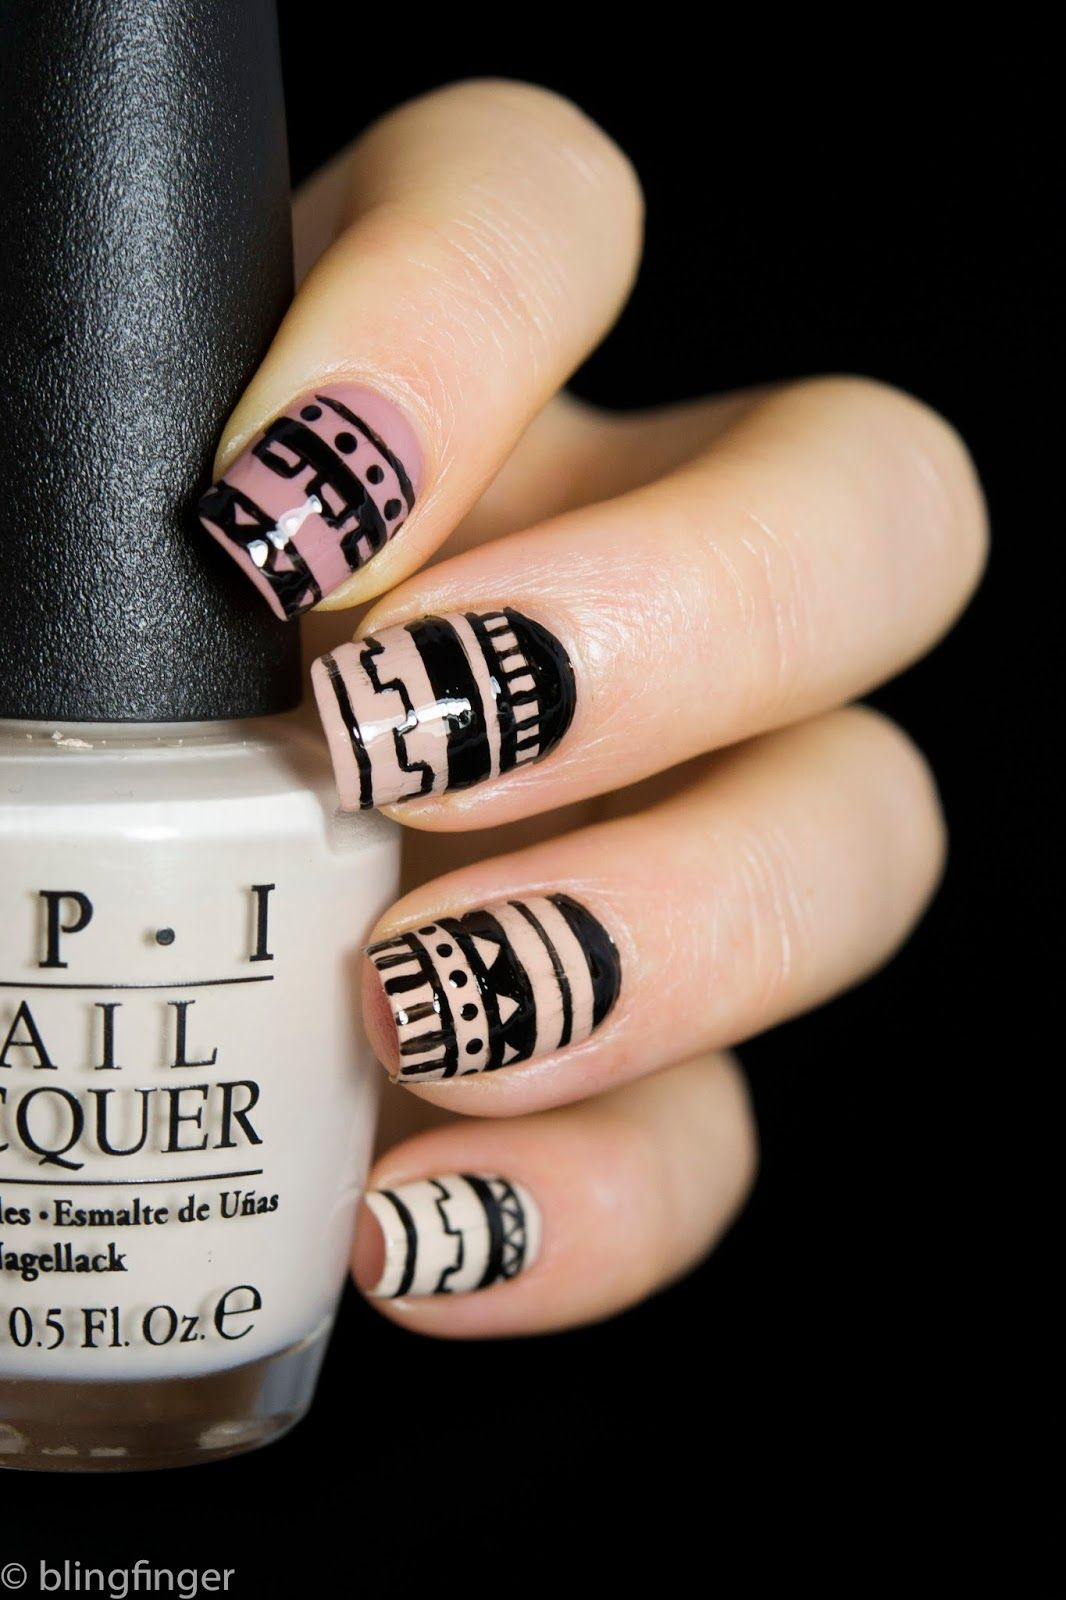 Pin by Emy on Nail Design | Pinterest | Aztec nail art and Aztec nails